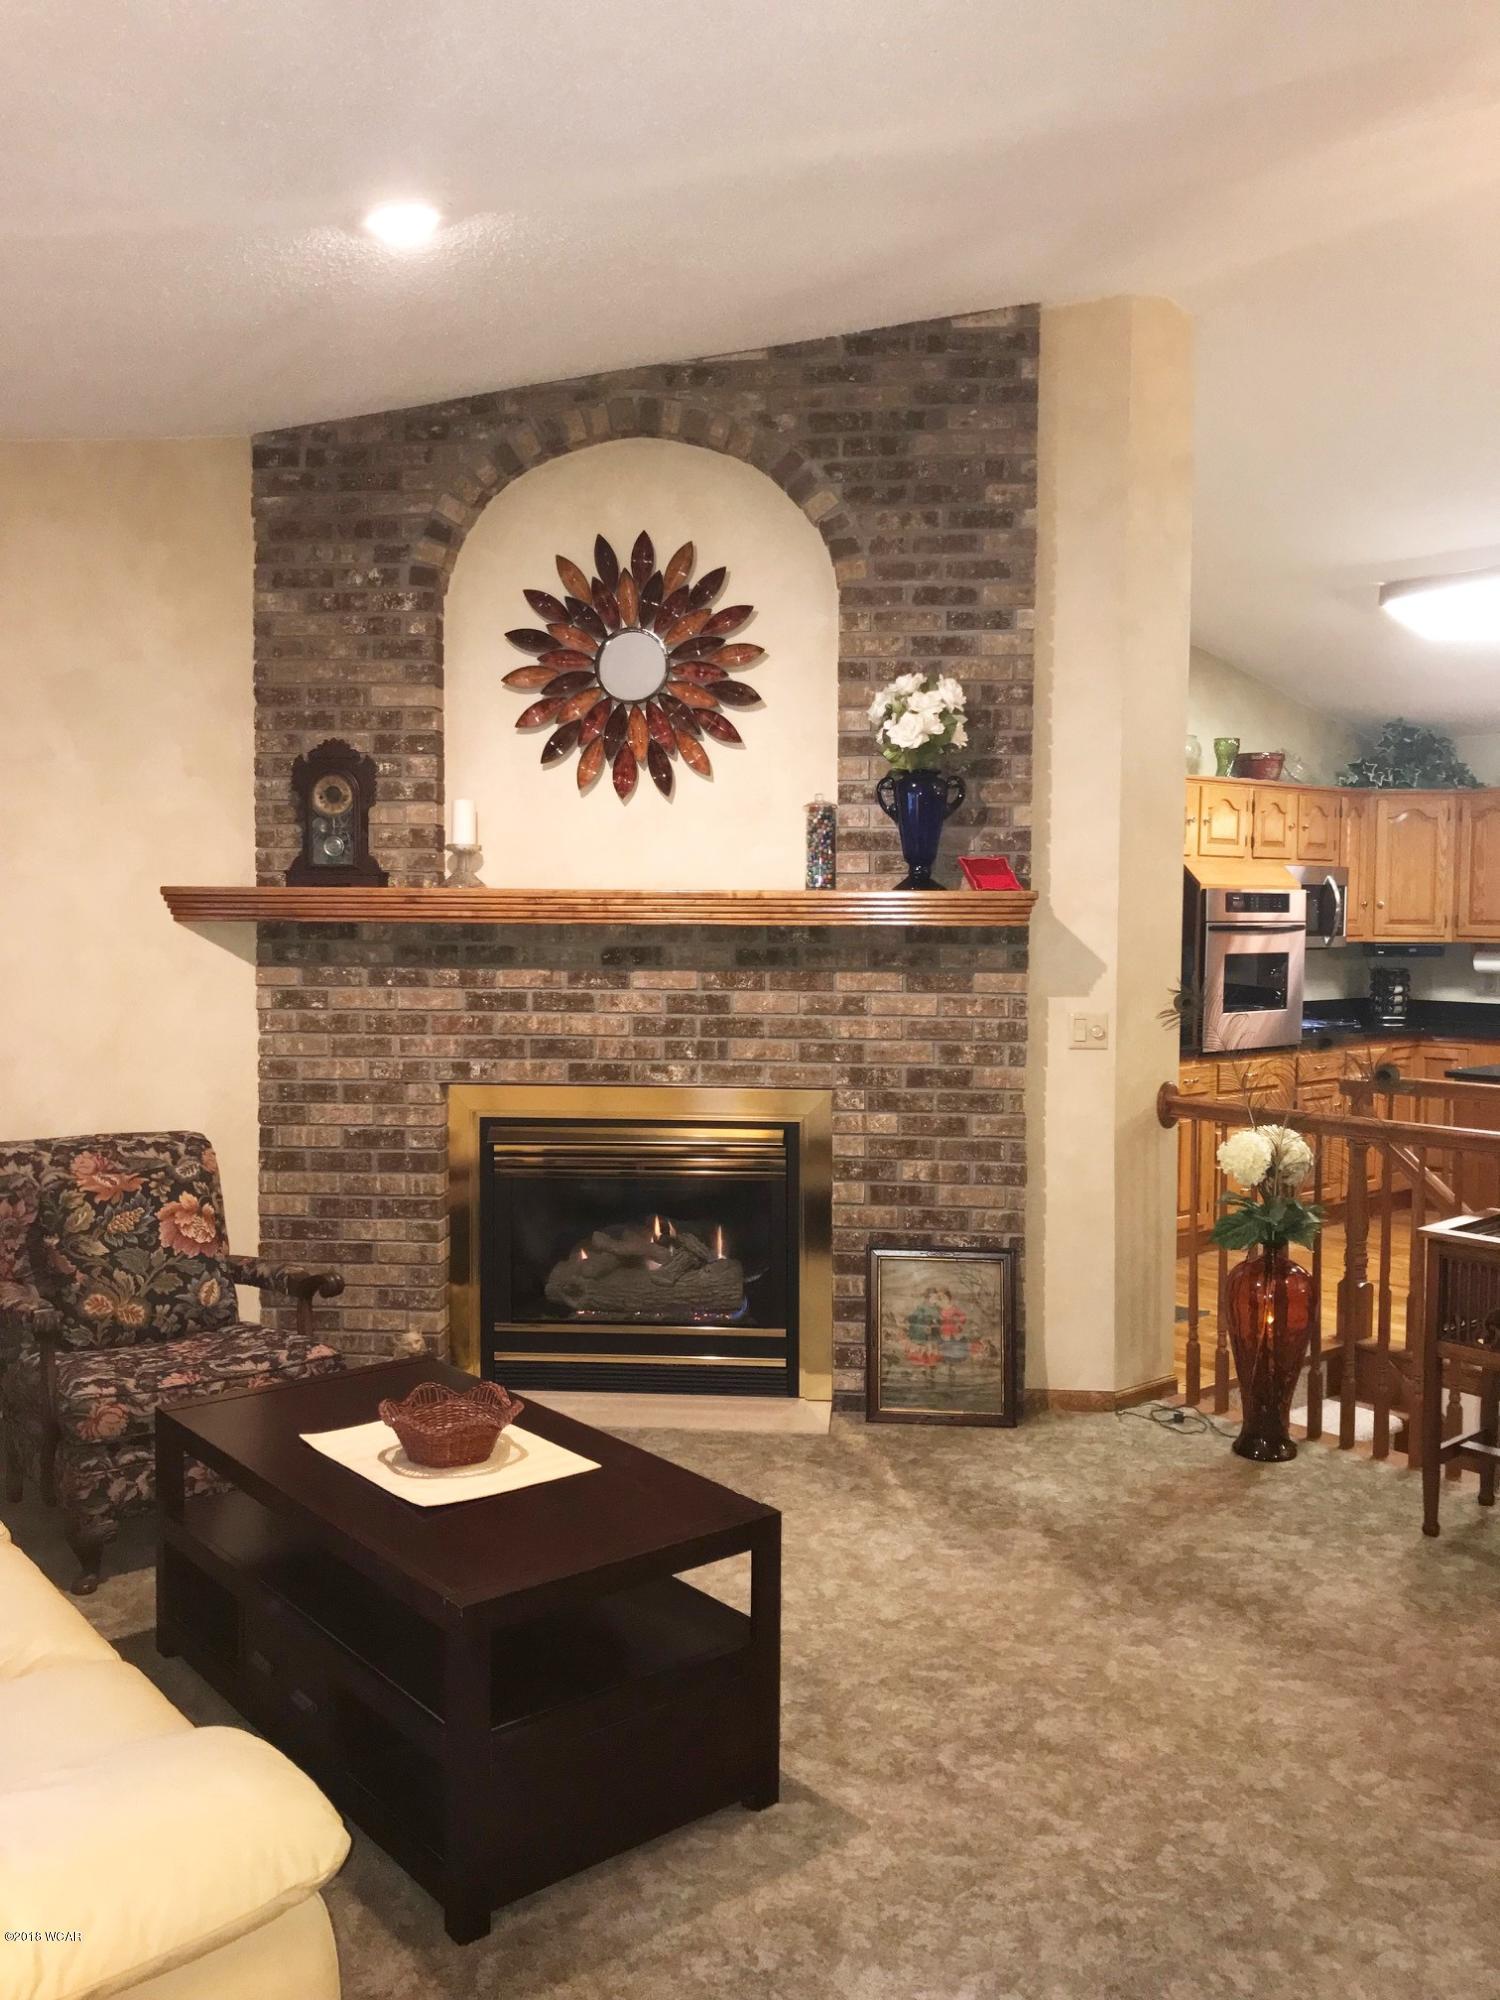 905 Johanna Avenue,Willmar,3 Bedrooms Bedrooms,2 BathroomsBathrooms,Single Family,Johanna Avenue,6032217